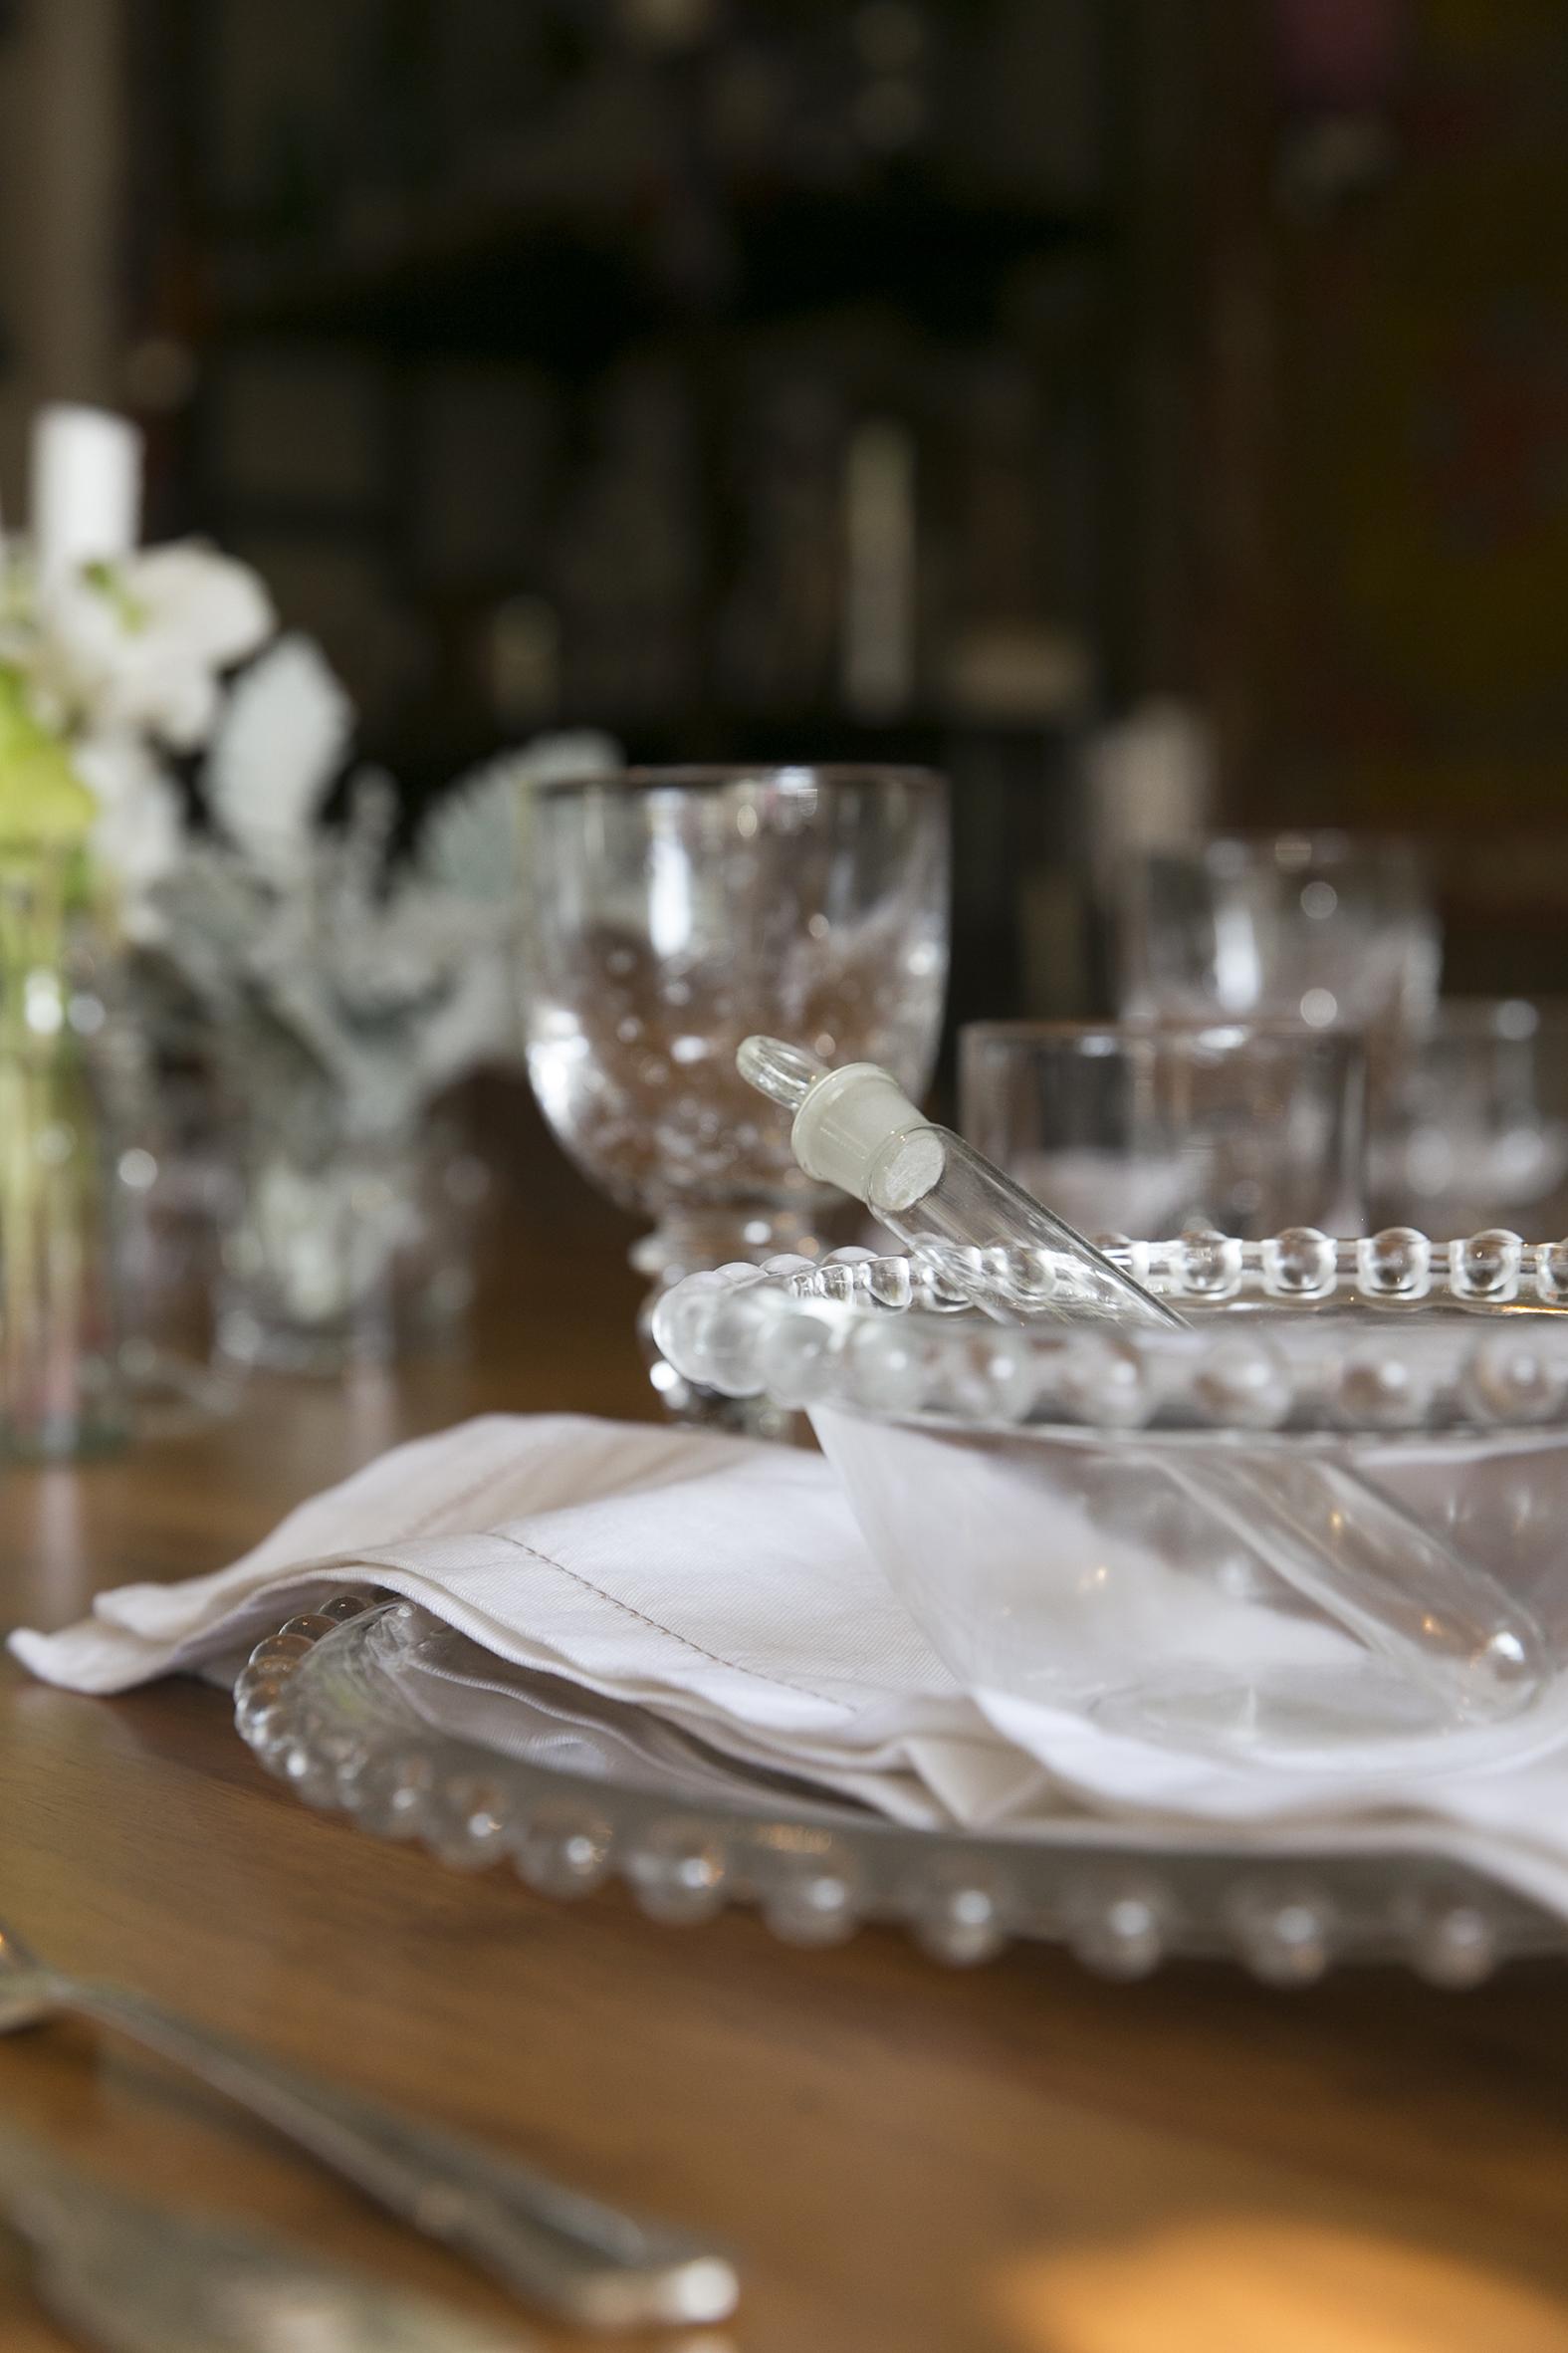 Glass Table Setting 005 copy.jpg